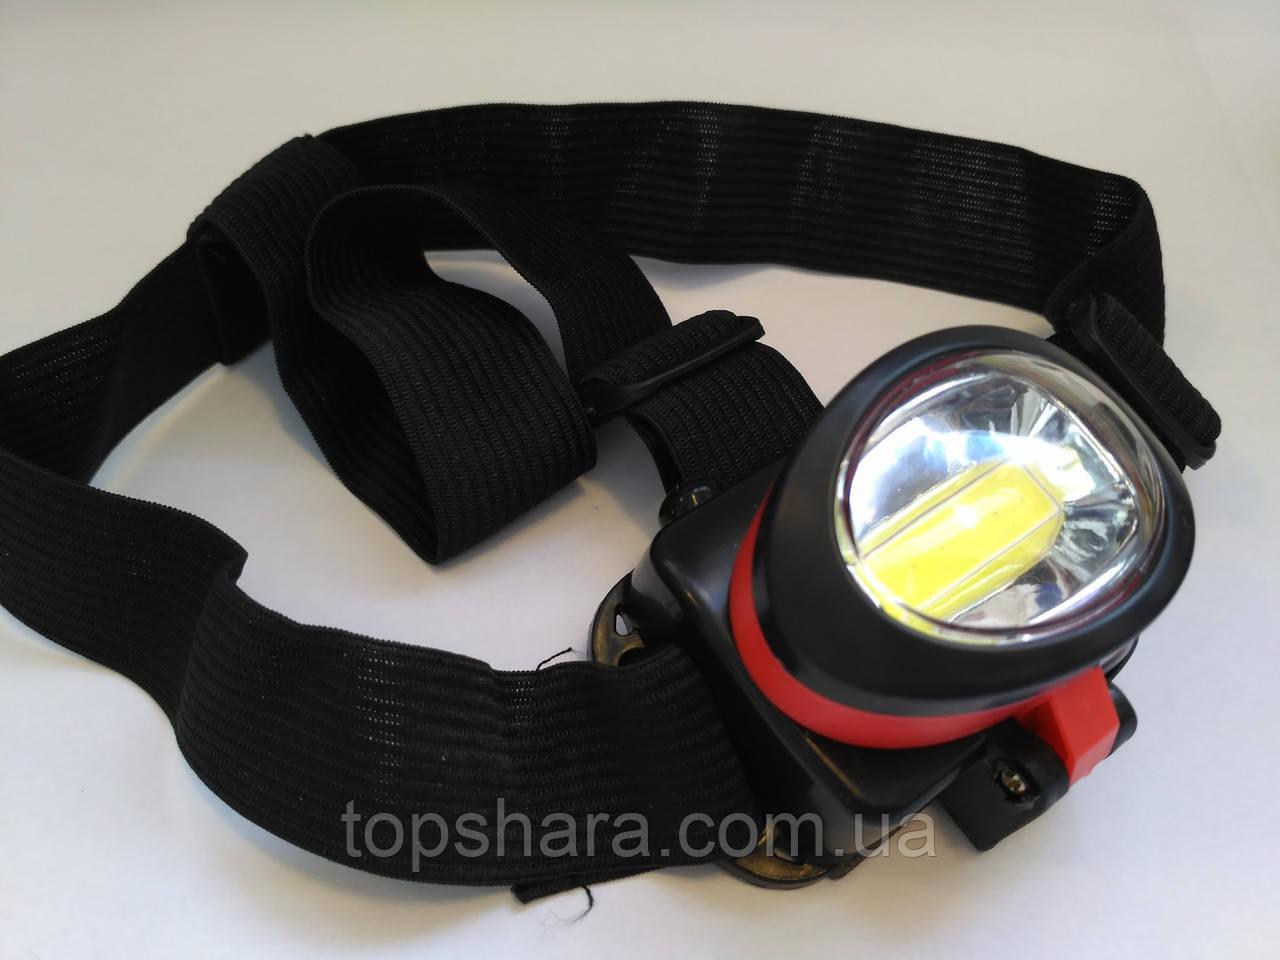 Налобный фонарь X-Bailong BL-539-COB! Led подсветка